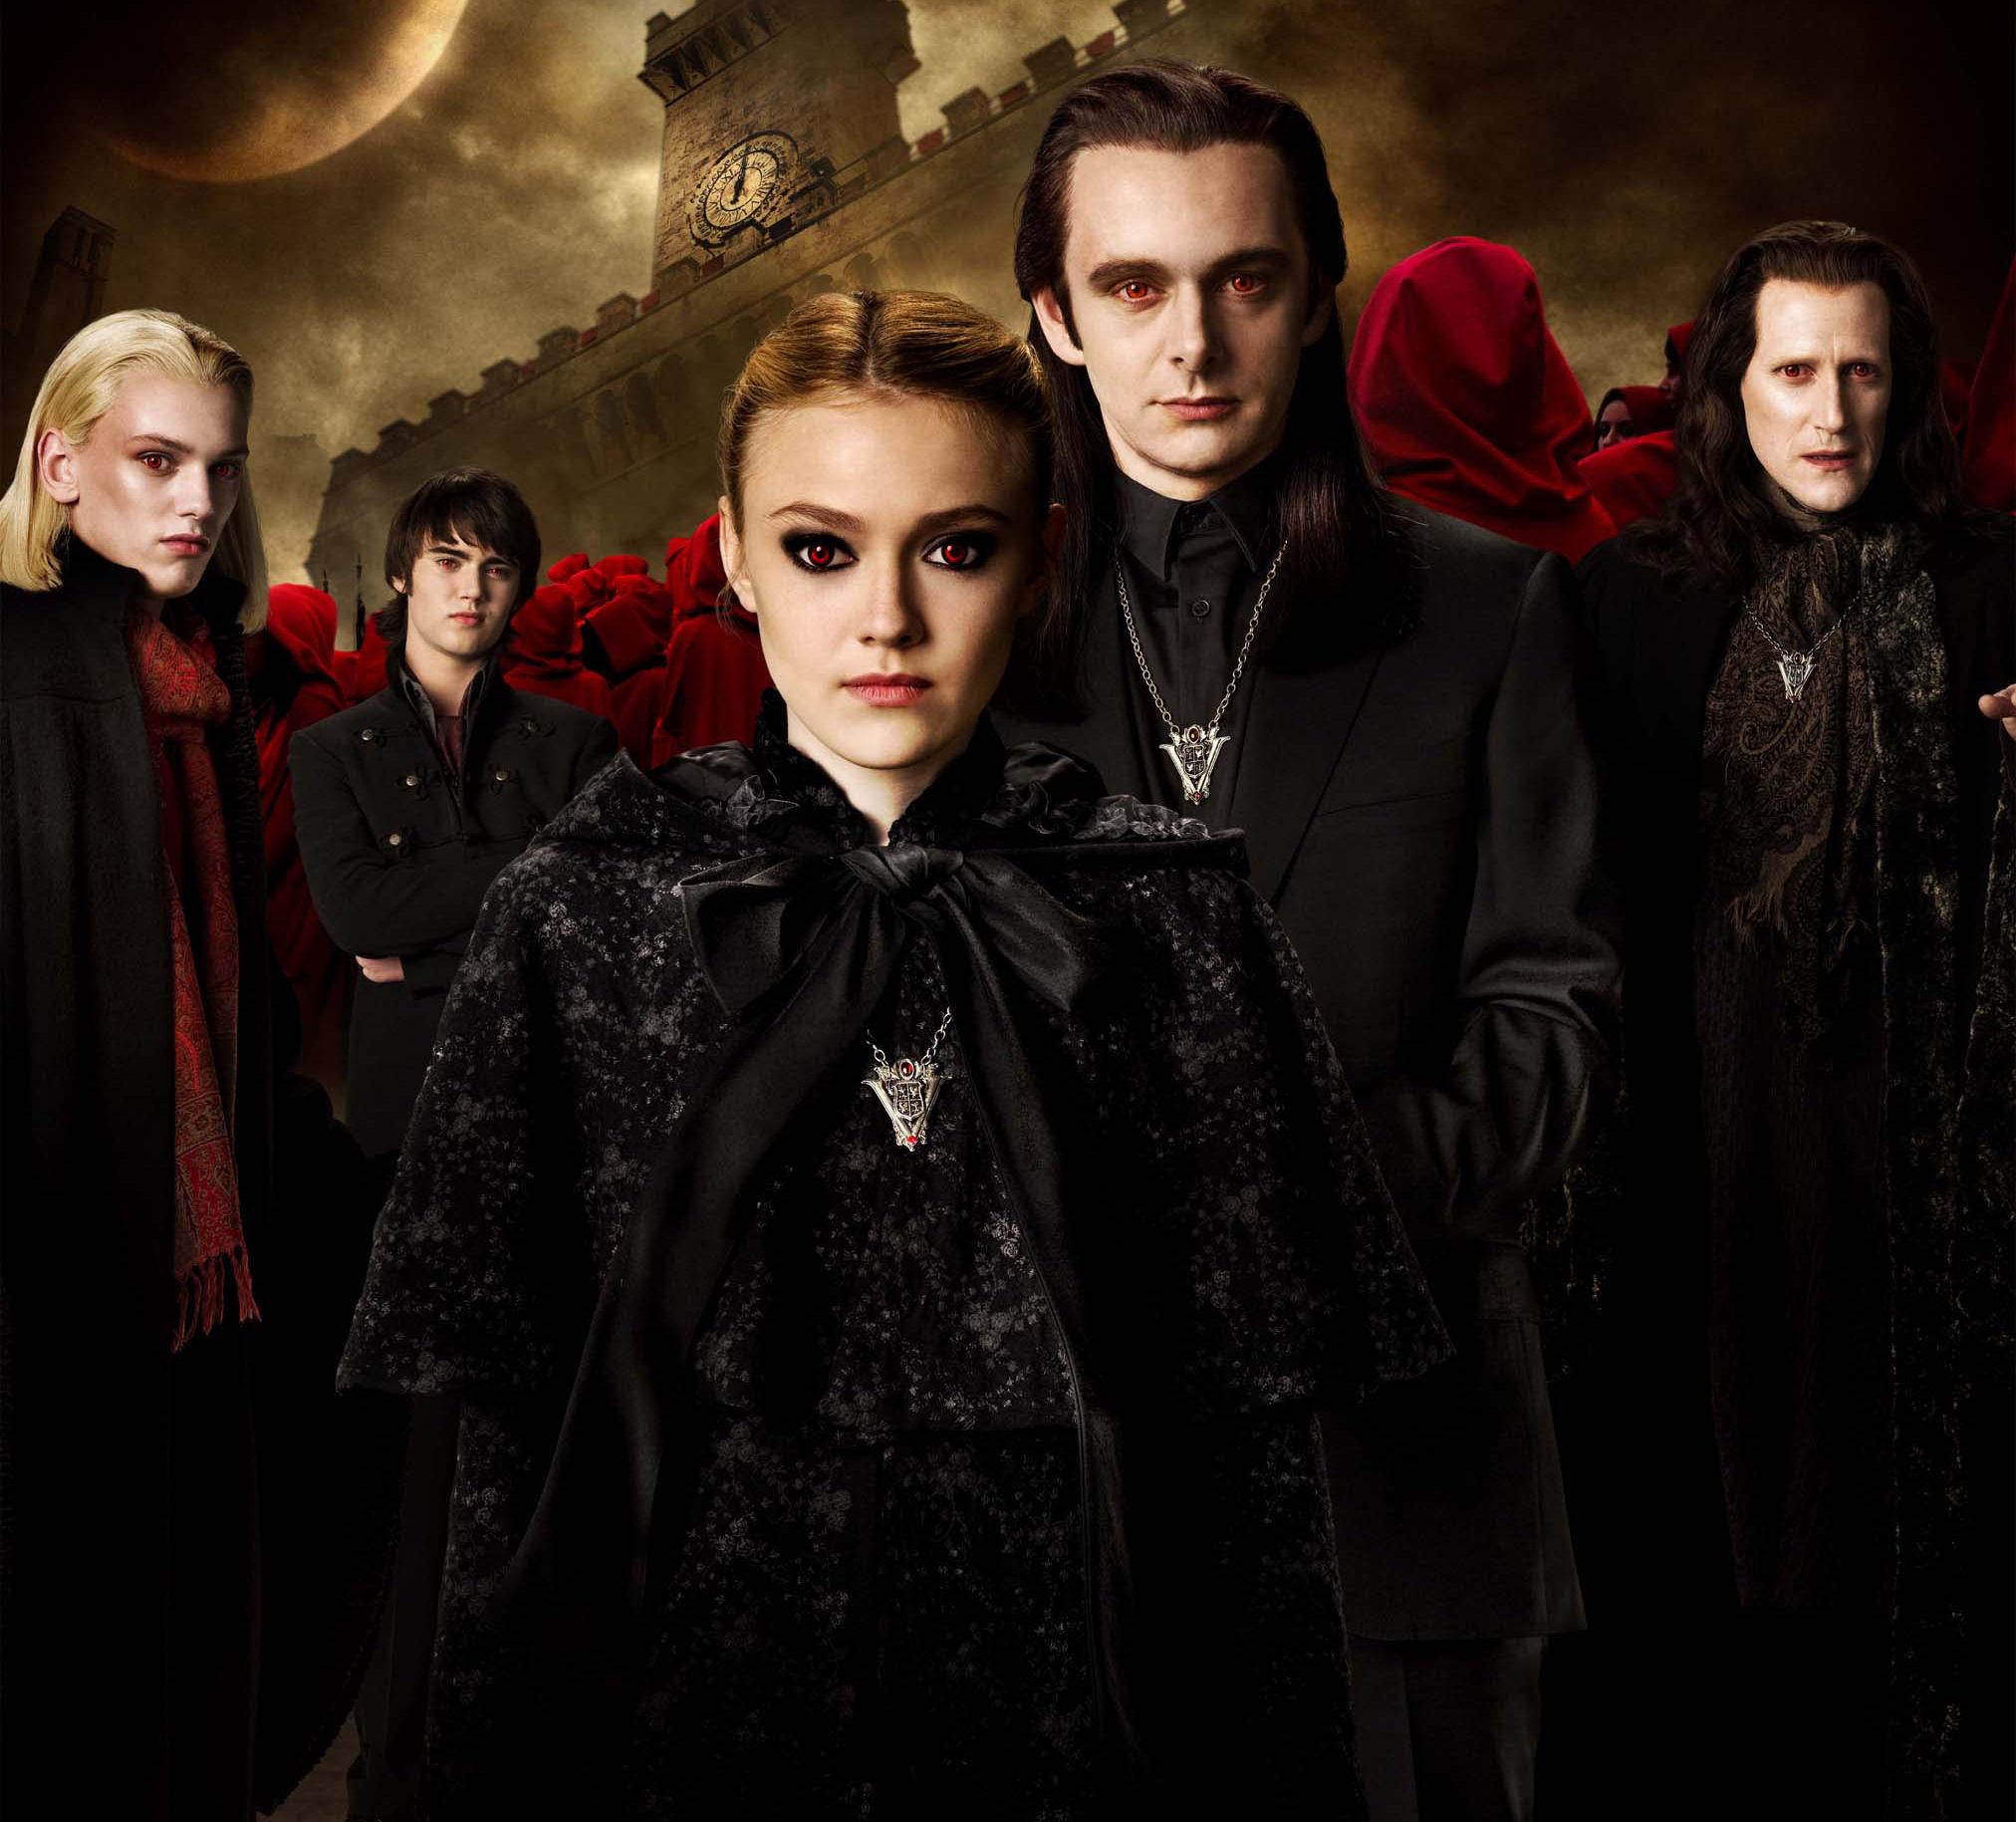 Twilight Saga: Halloween Costume Guide